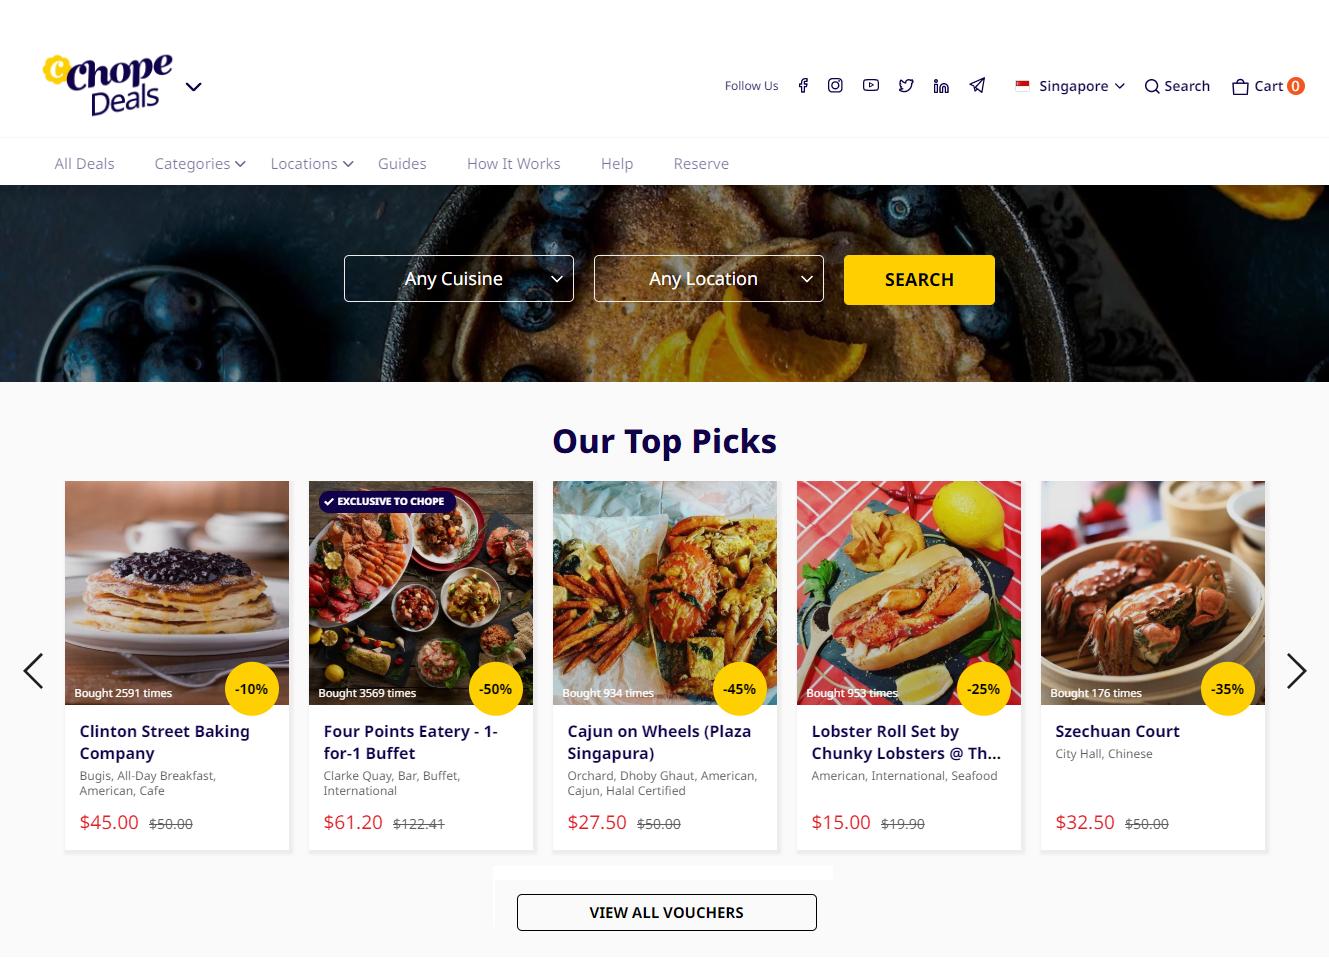 ChopeDeals Online Food Festival 2019 Singapore